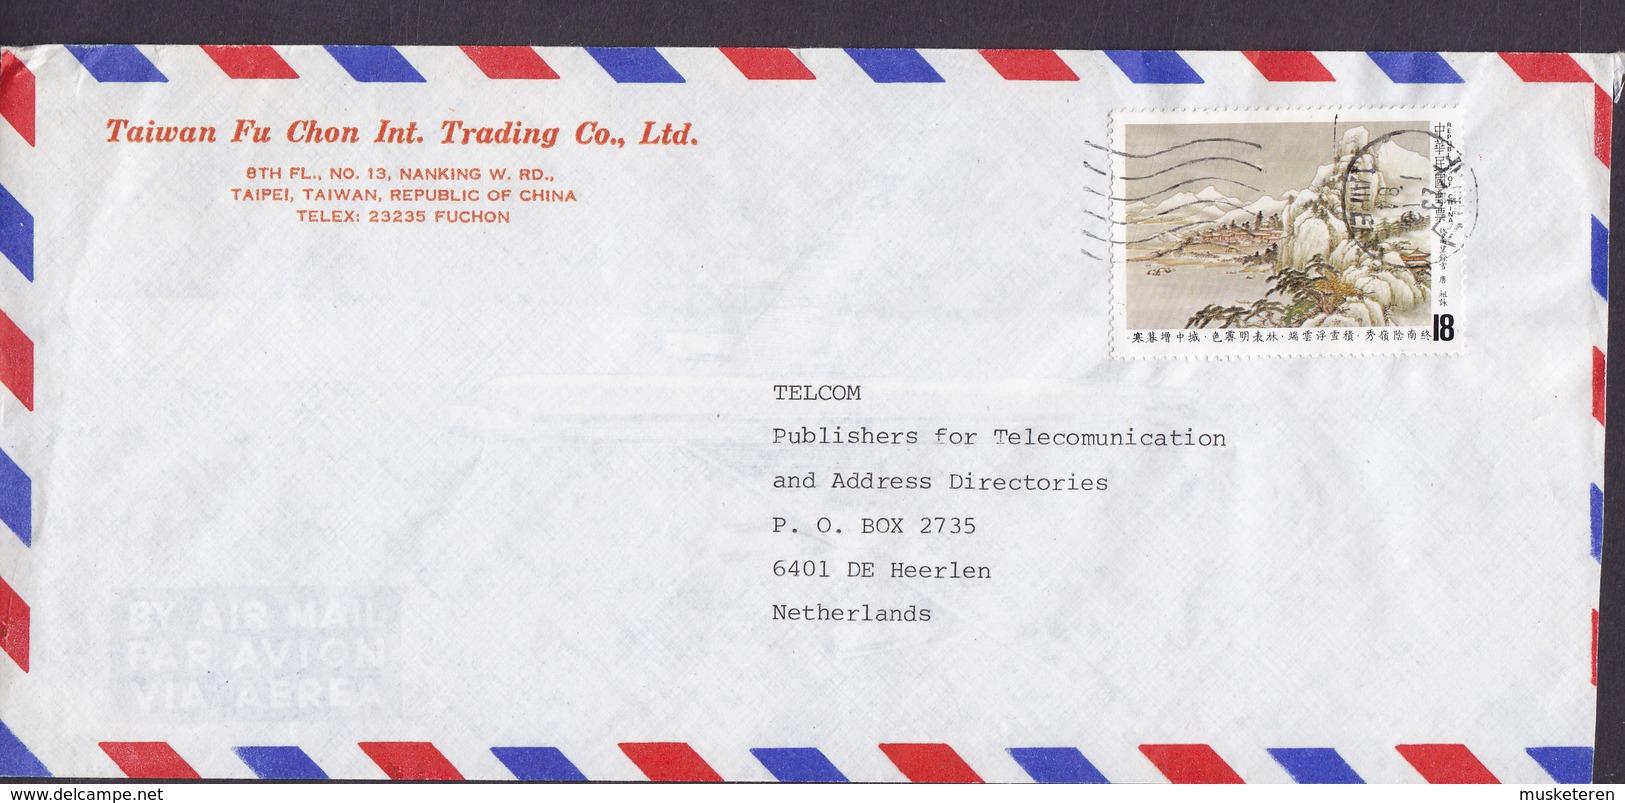 TAIWAN FU CHON INT. TRADING Co. TAIPEI 1984 Cover Brief HEERLEN Netherlands Chinesische Dichtkunst Tsu Yung - 1945-... Republik China